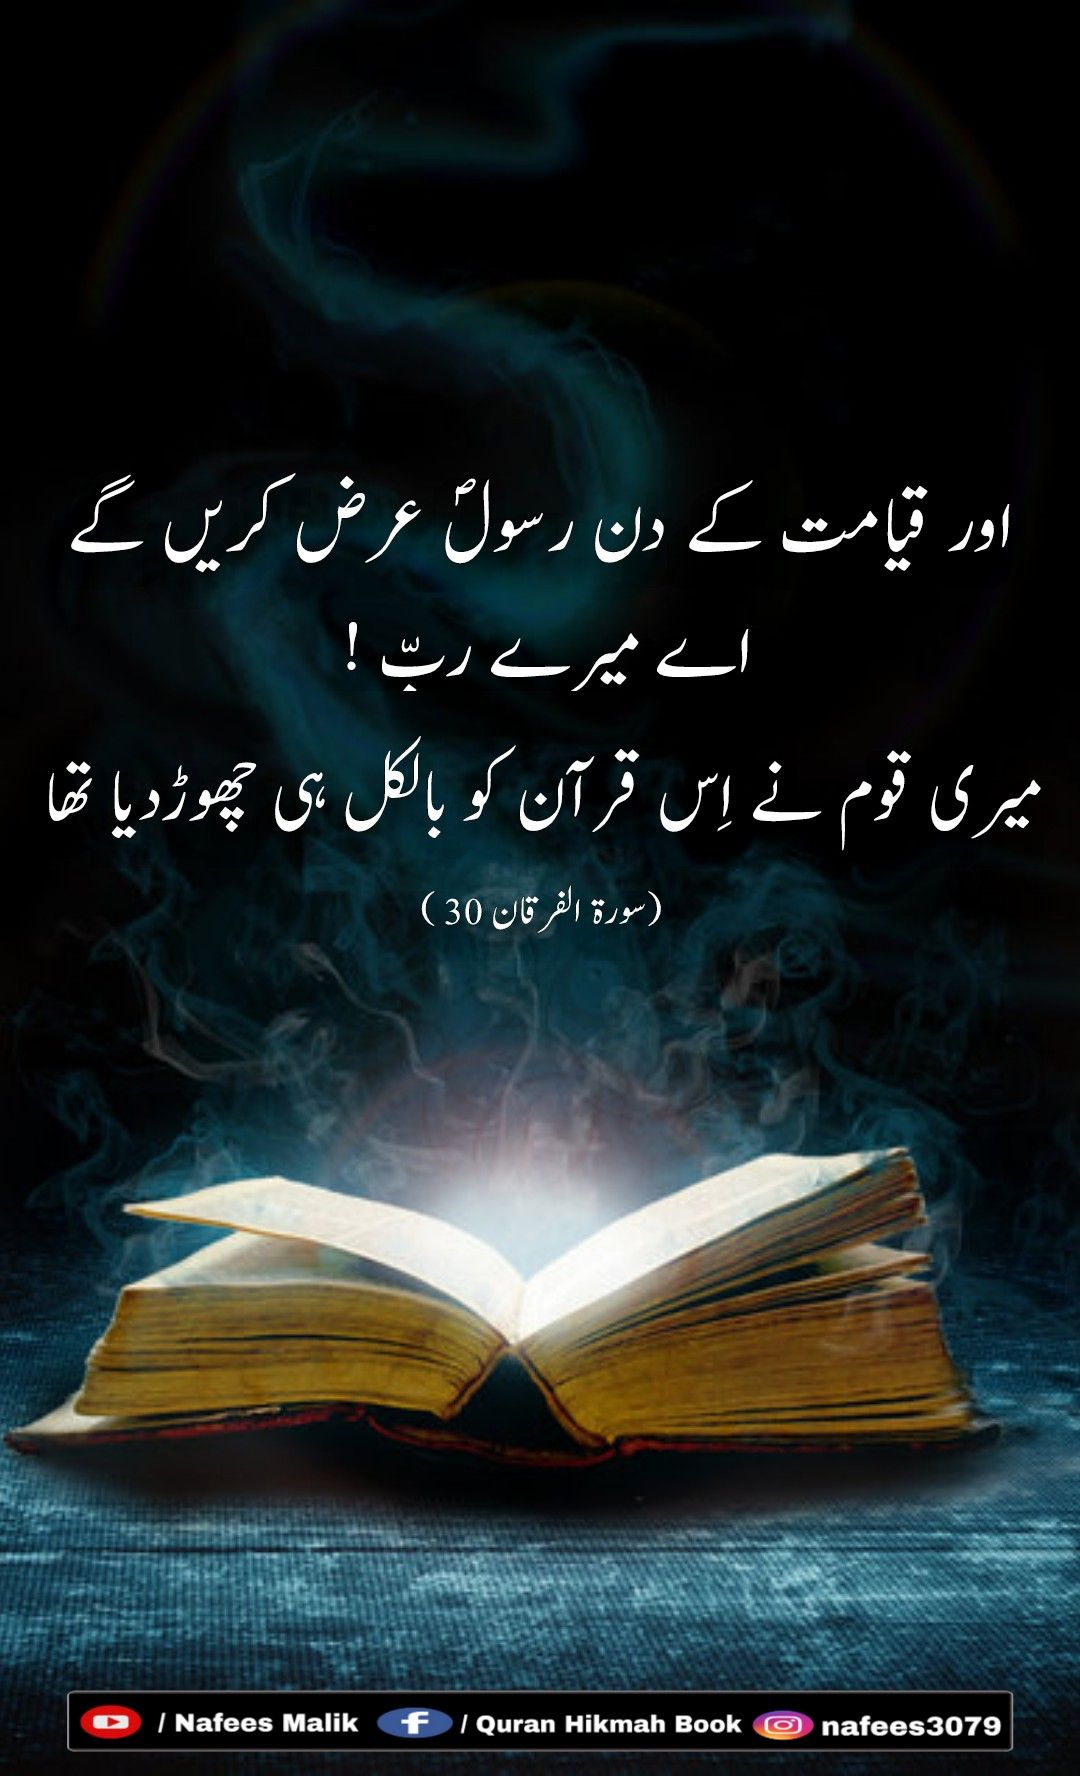 Aŗisħasaŗ Aŗaz Beautiful Islamic Quotes Quran Surah Quran Quotes